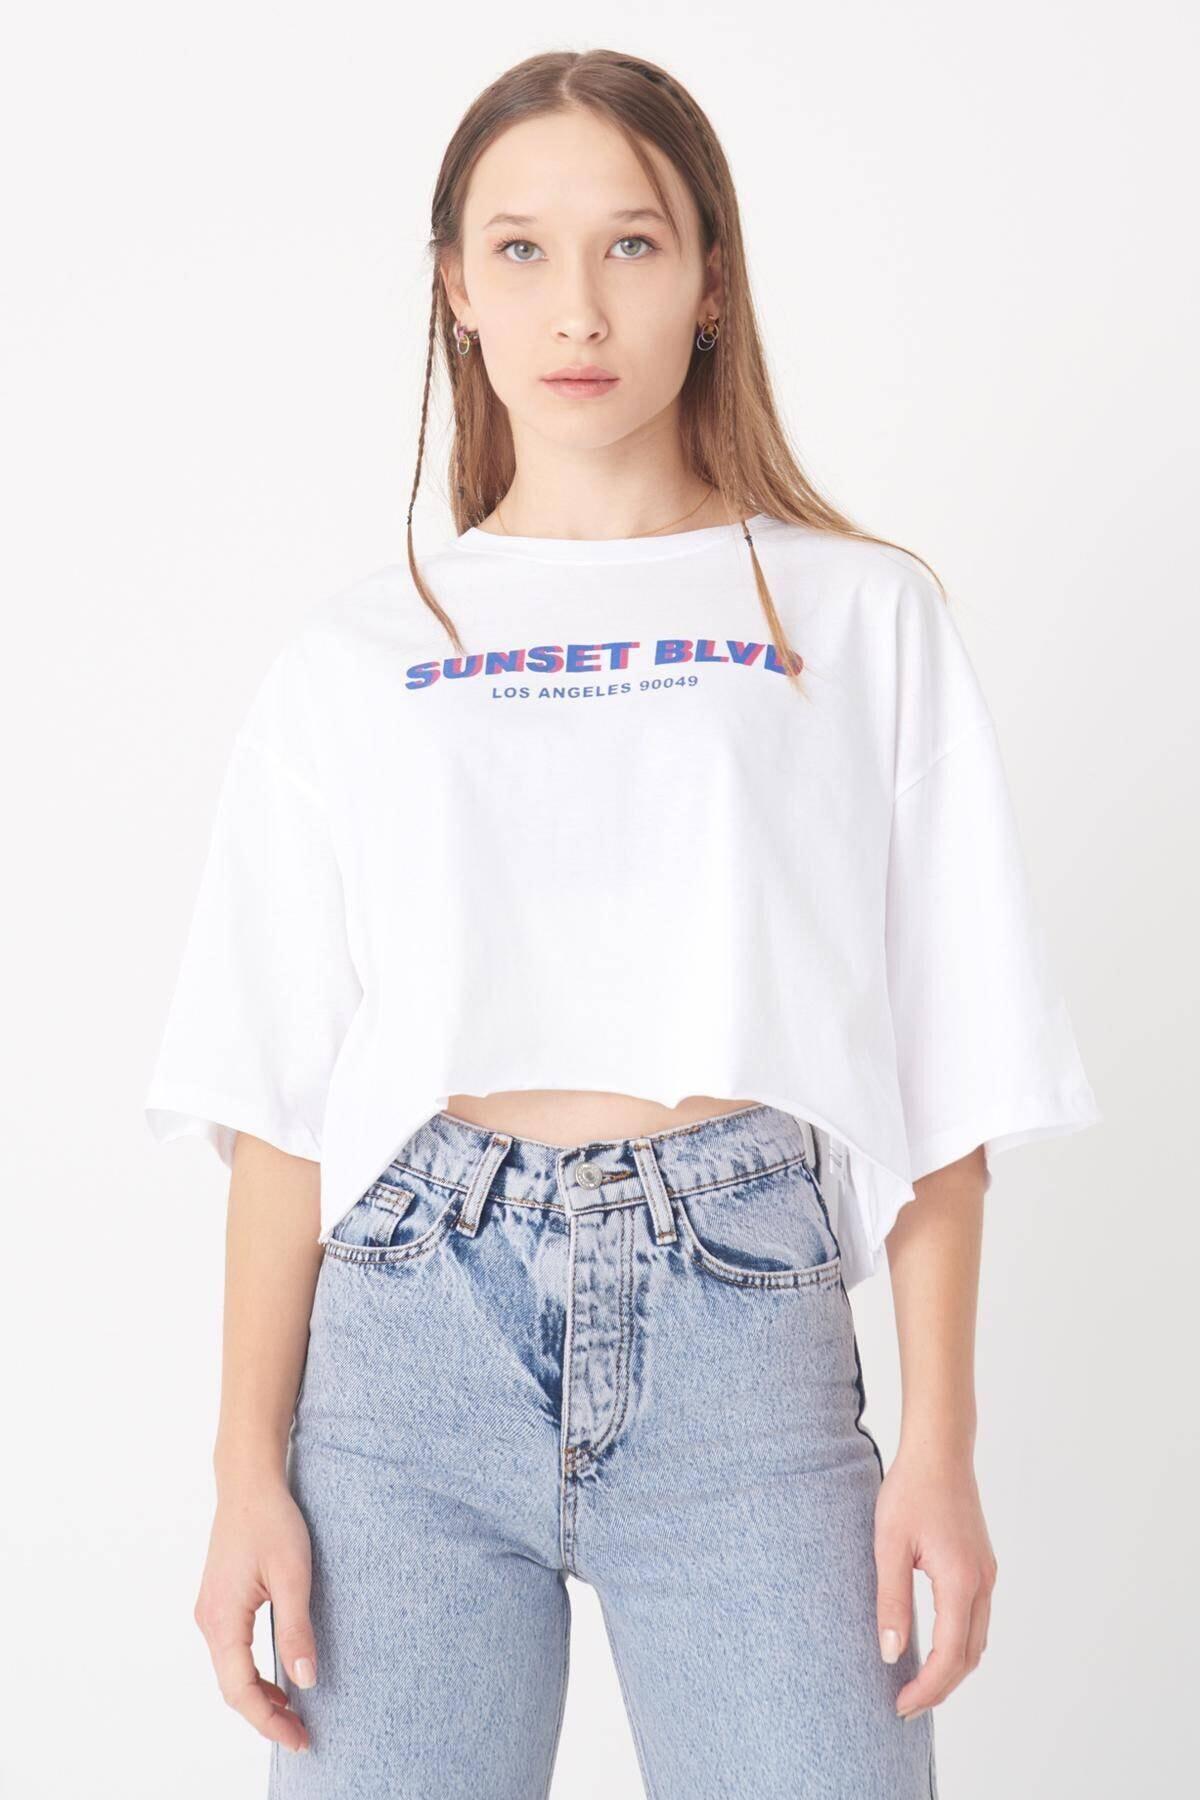 Kadın Beyaz Yazılı Lazer Kesim T-Shirt P0975 - T11 Adx-0000022405